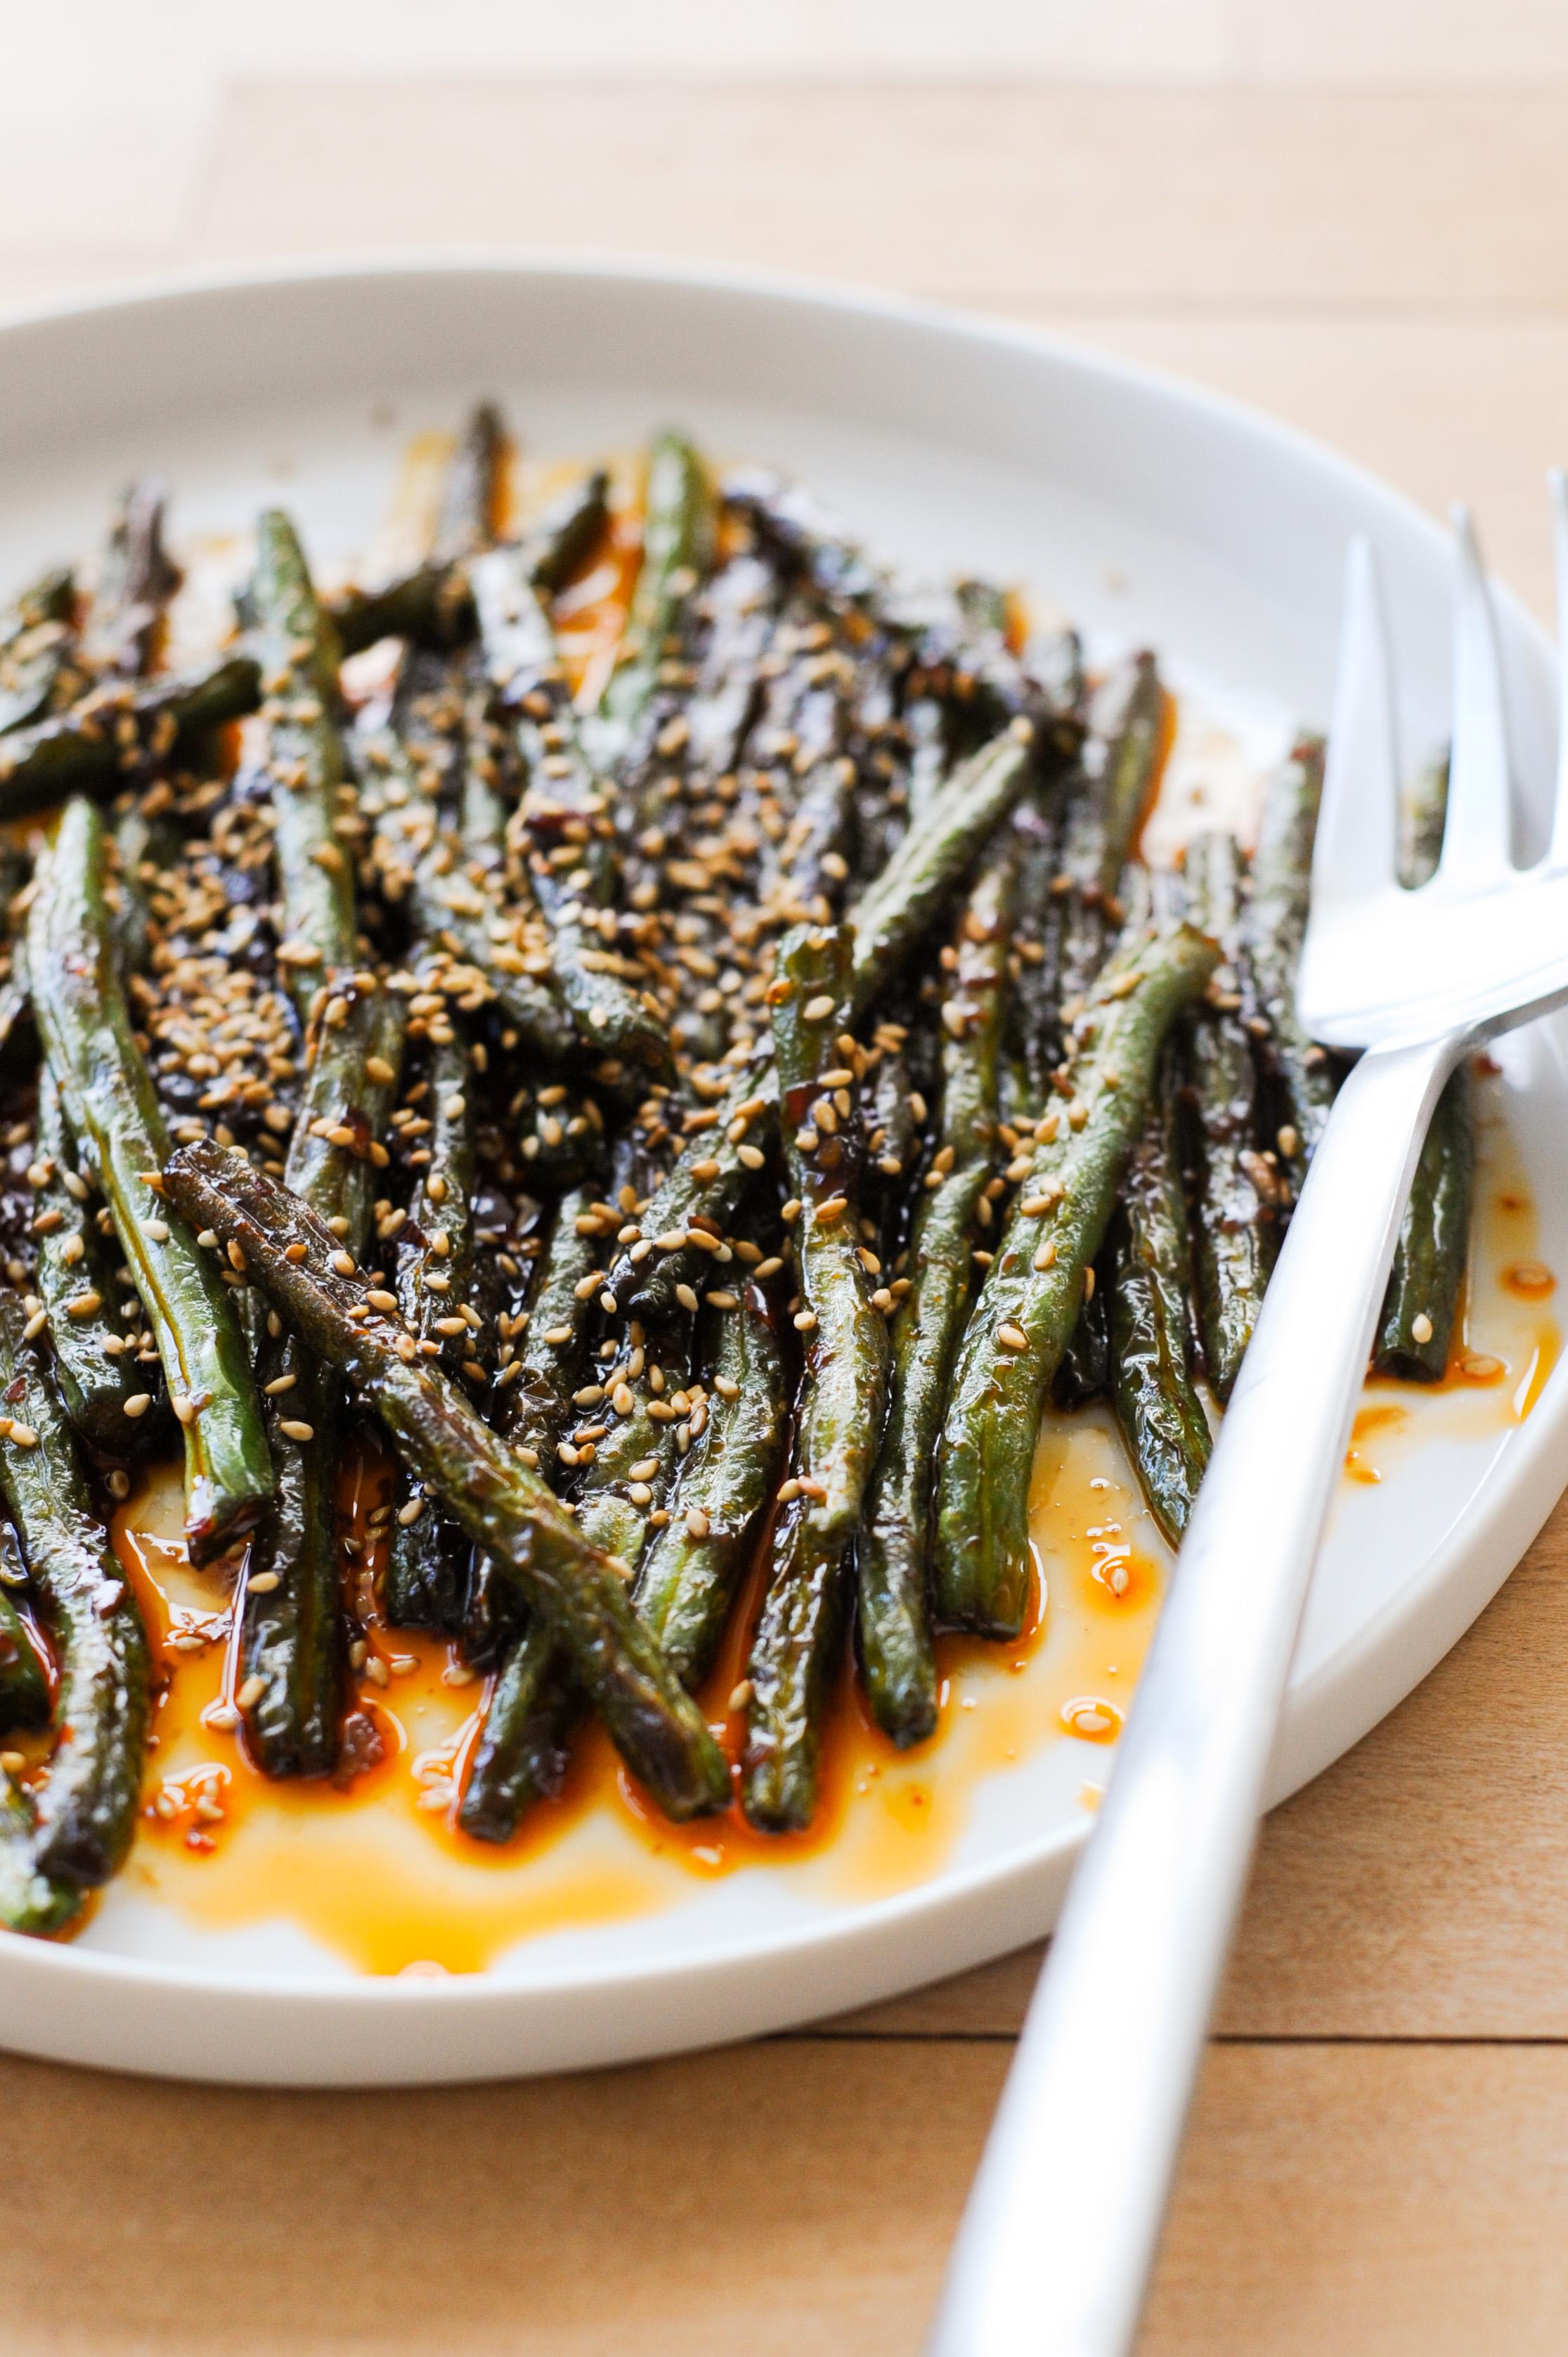 Szechuan-Style Spicy Green Beans | amodestfeast.com | @amodestfeast